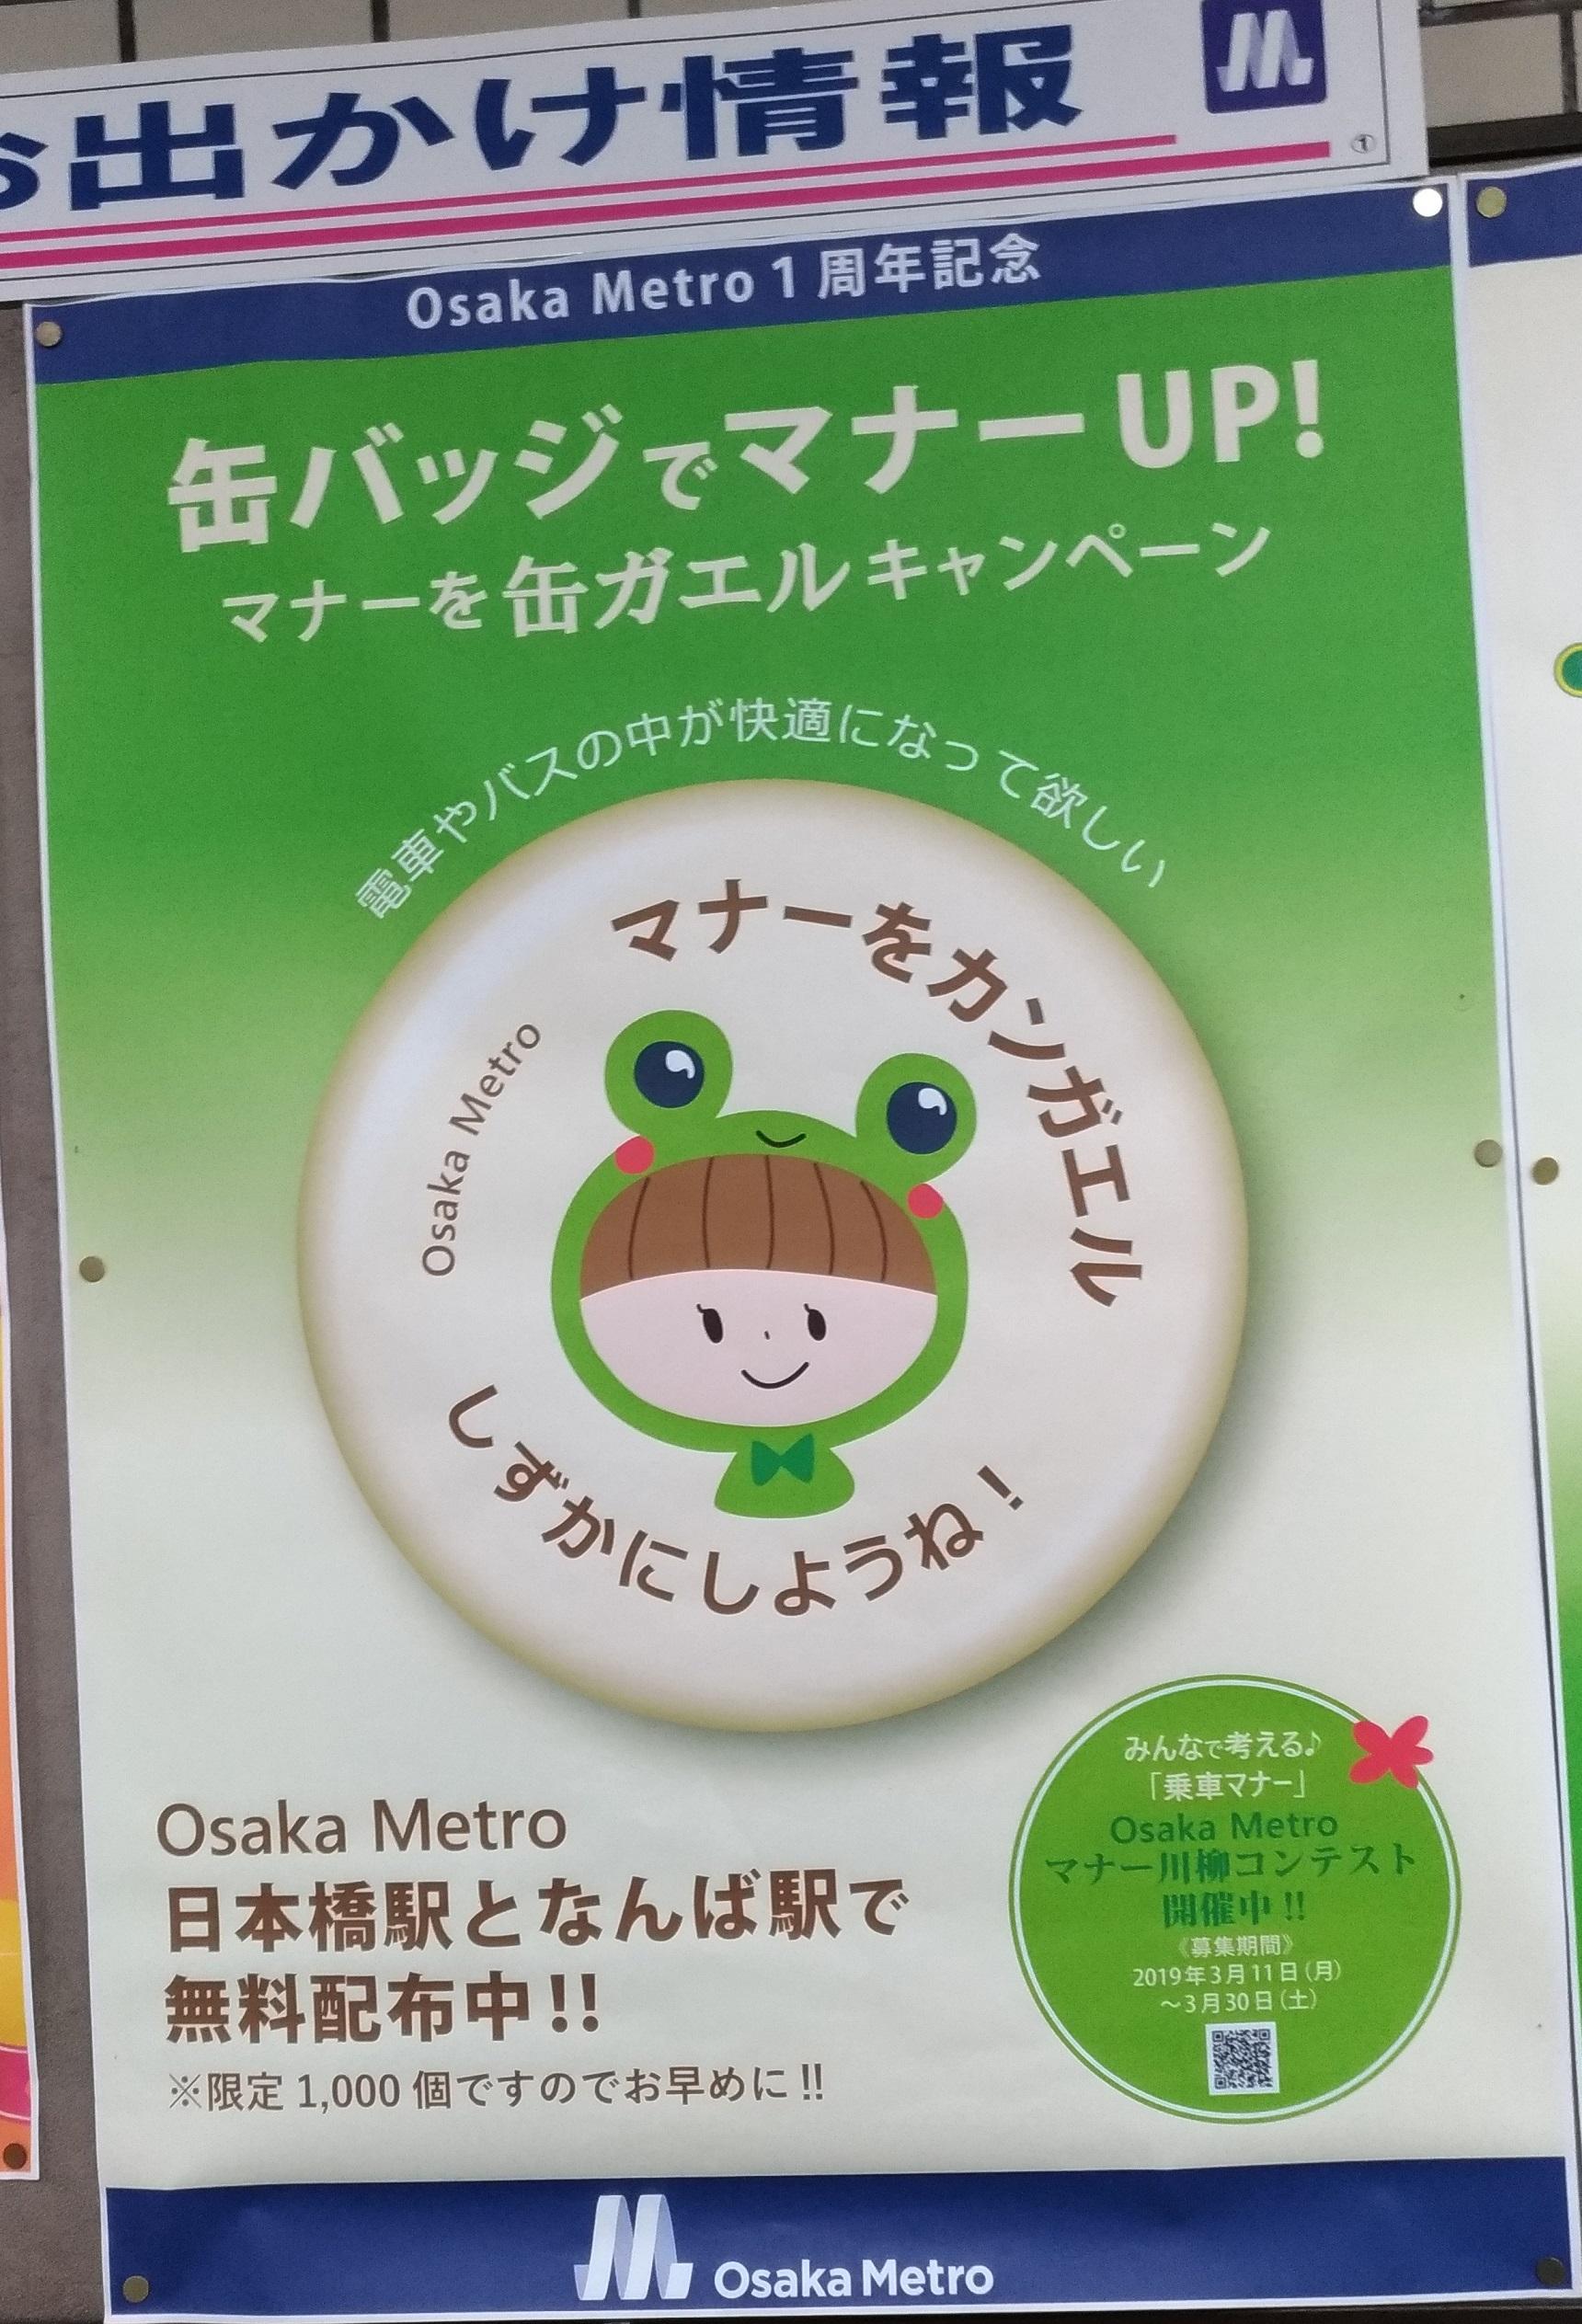 osaka_metro_kan_baggi_mana.jpg